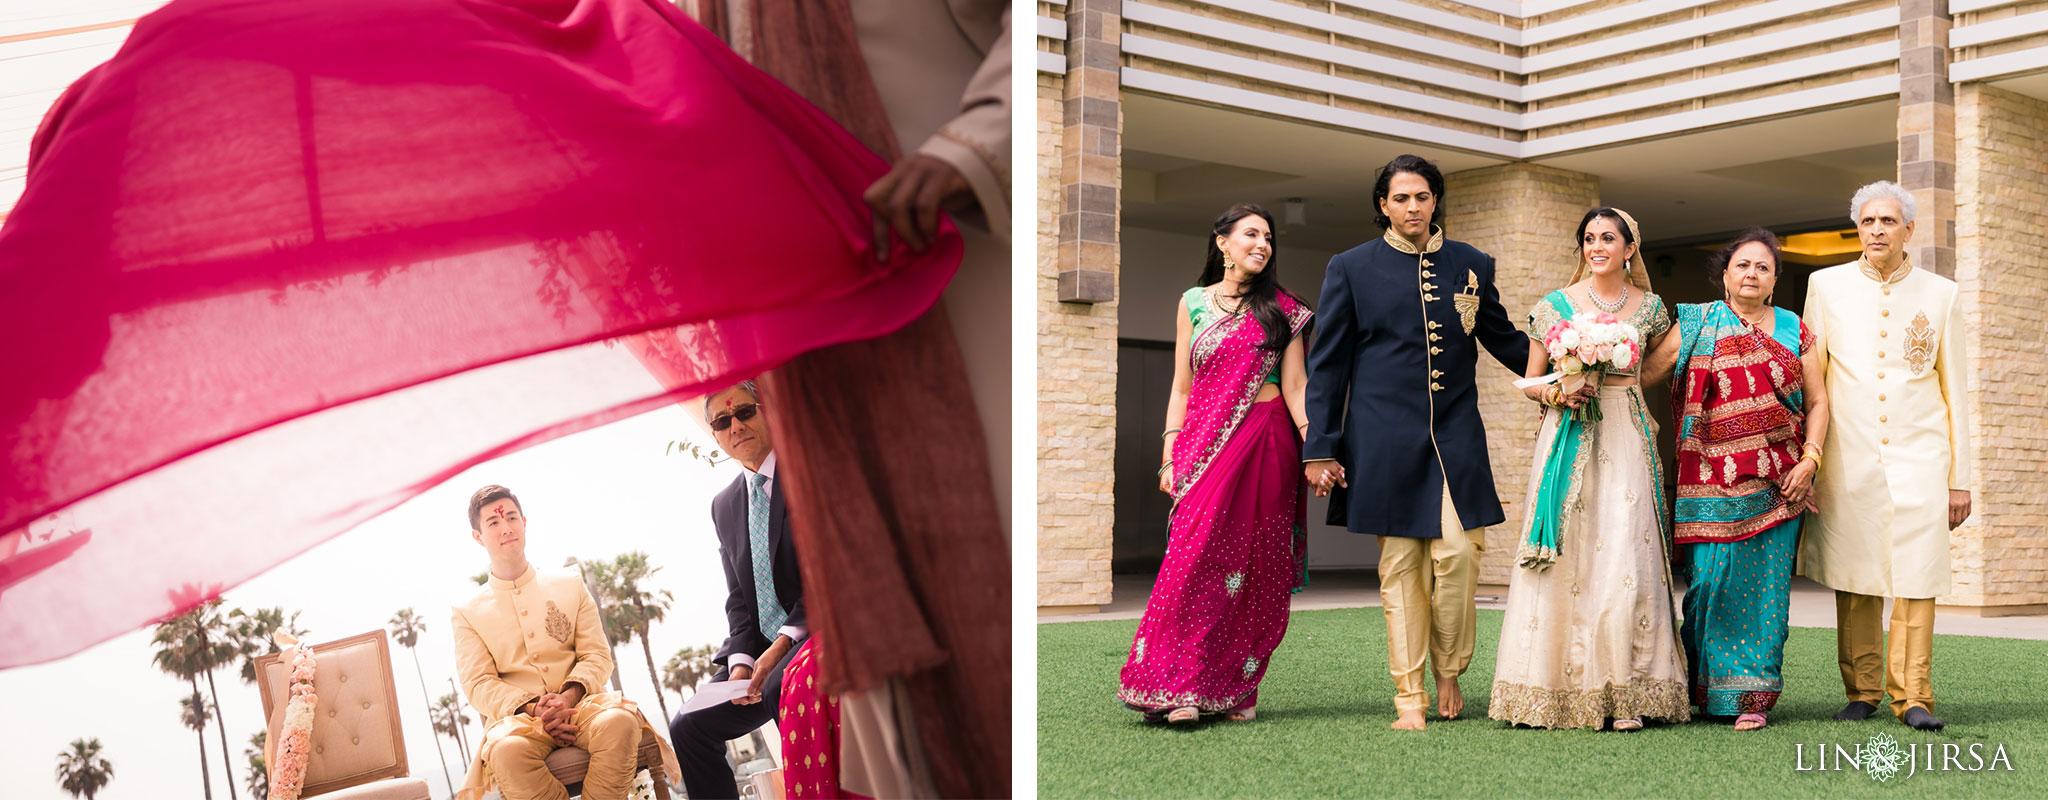 26 pasea hotel and spa huntington beach indian wedding ceremony photography